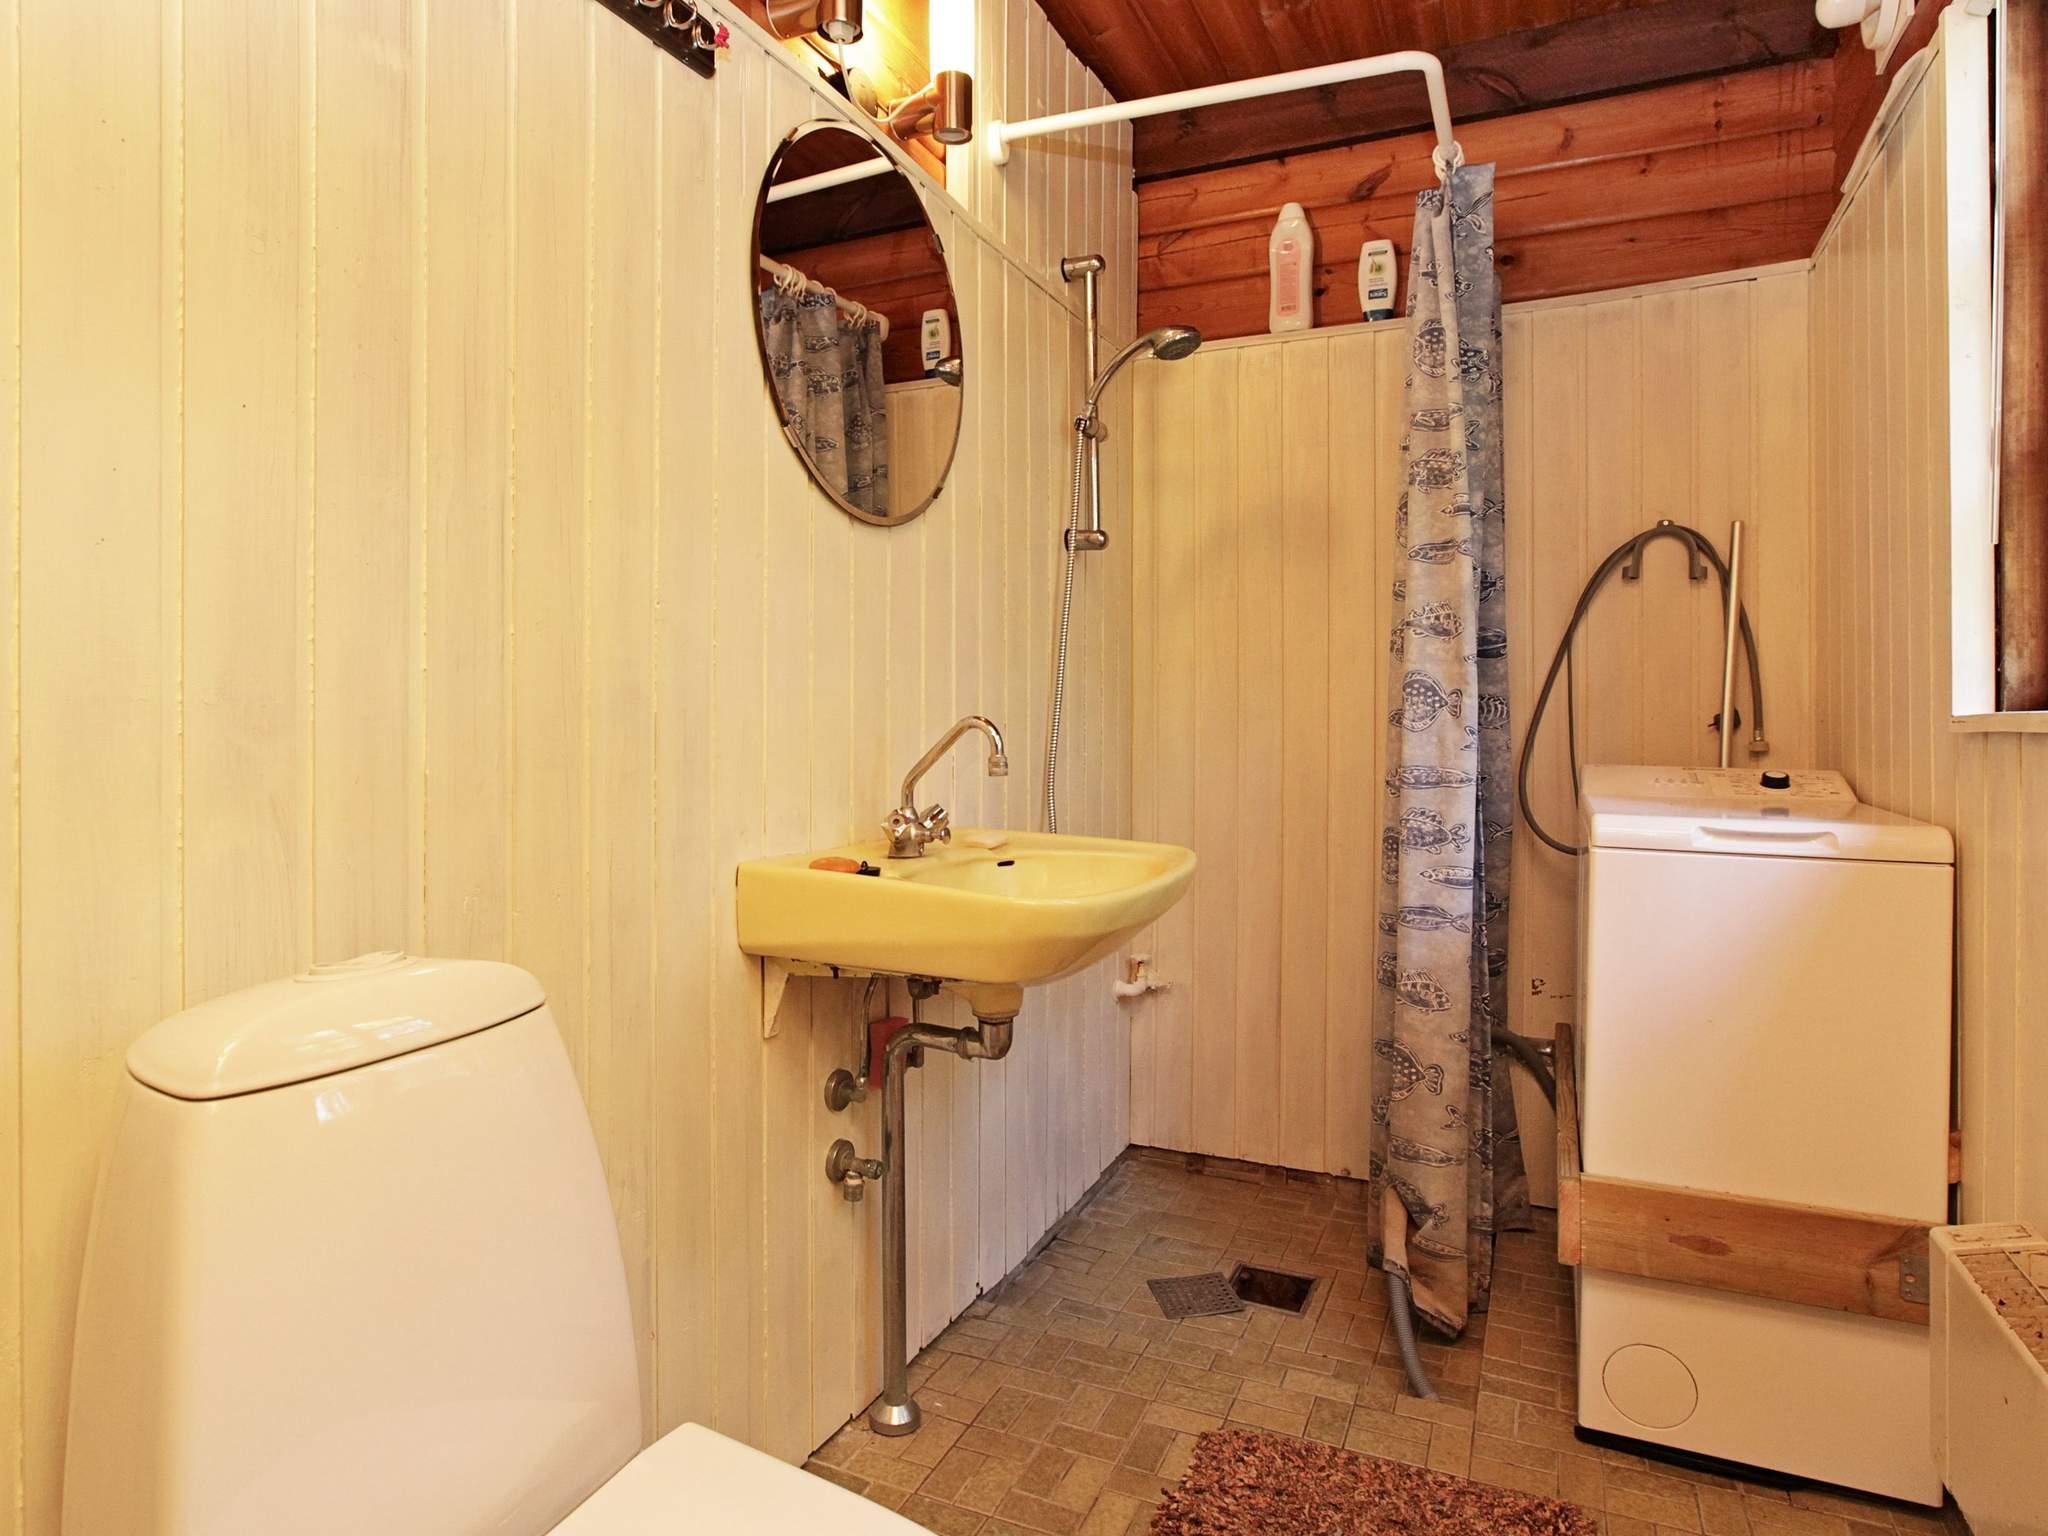 Ferienhaus Yderby Lyng (87400), Yderby, , Westseeland, Dänemark, Bild 12